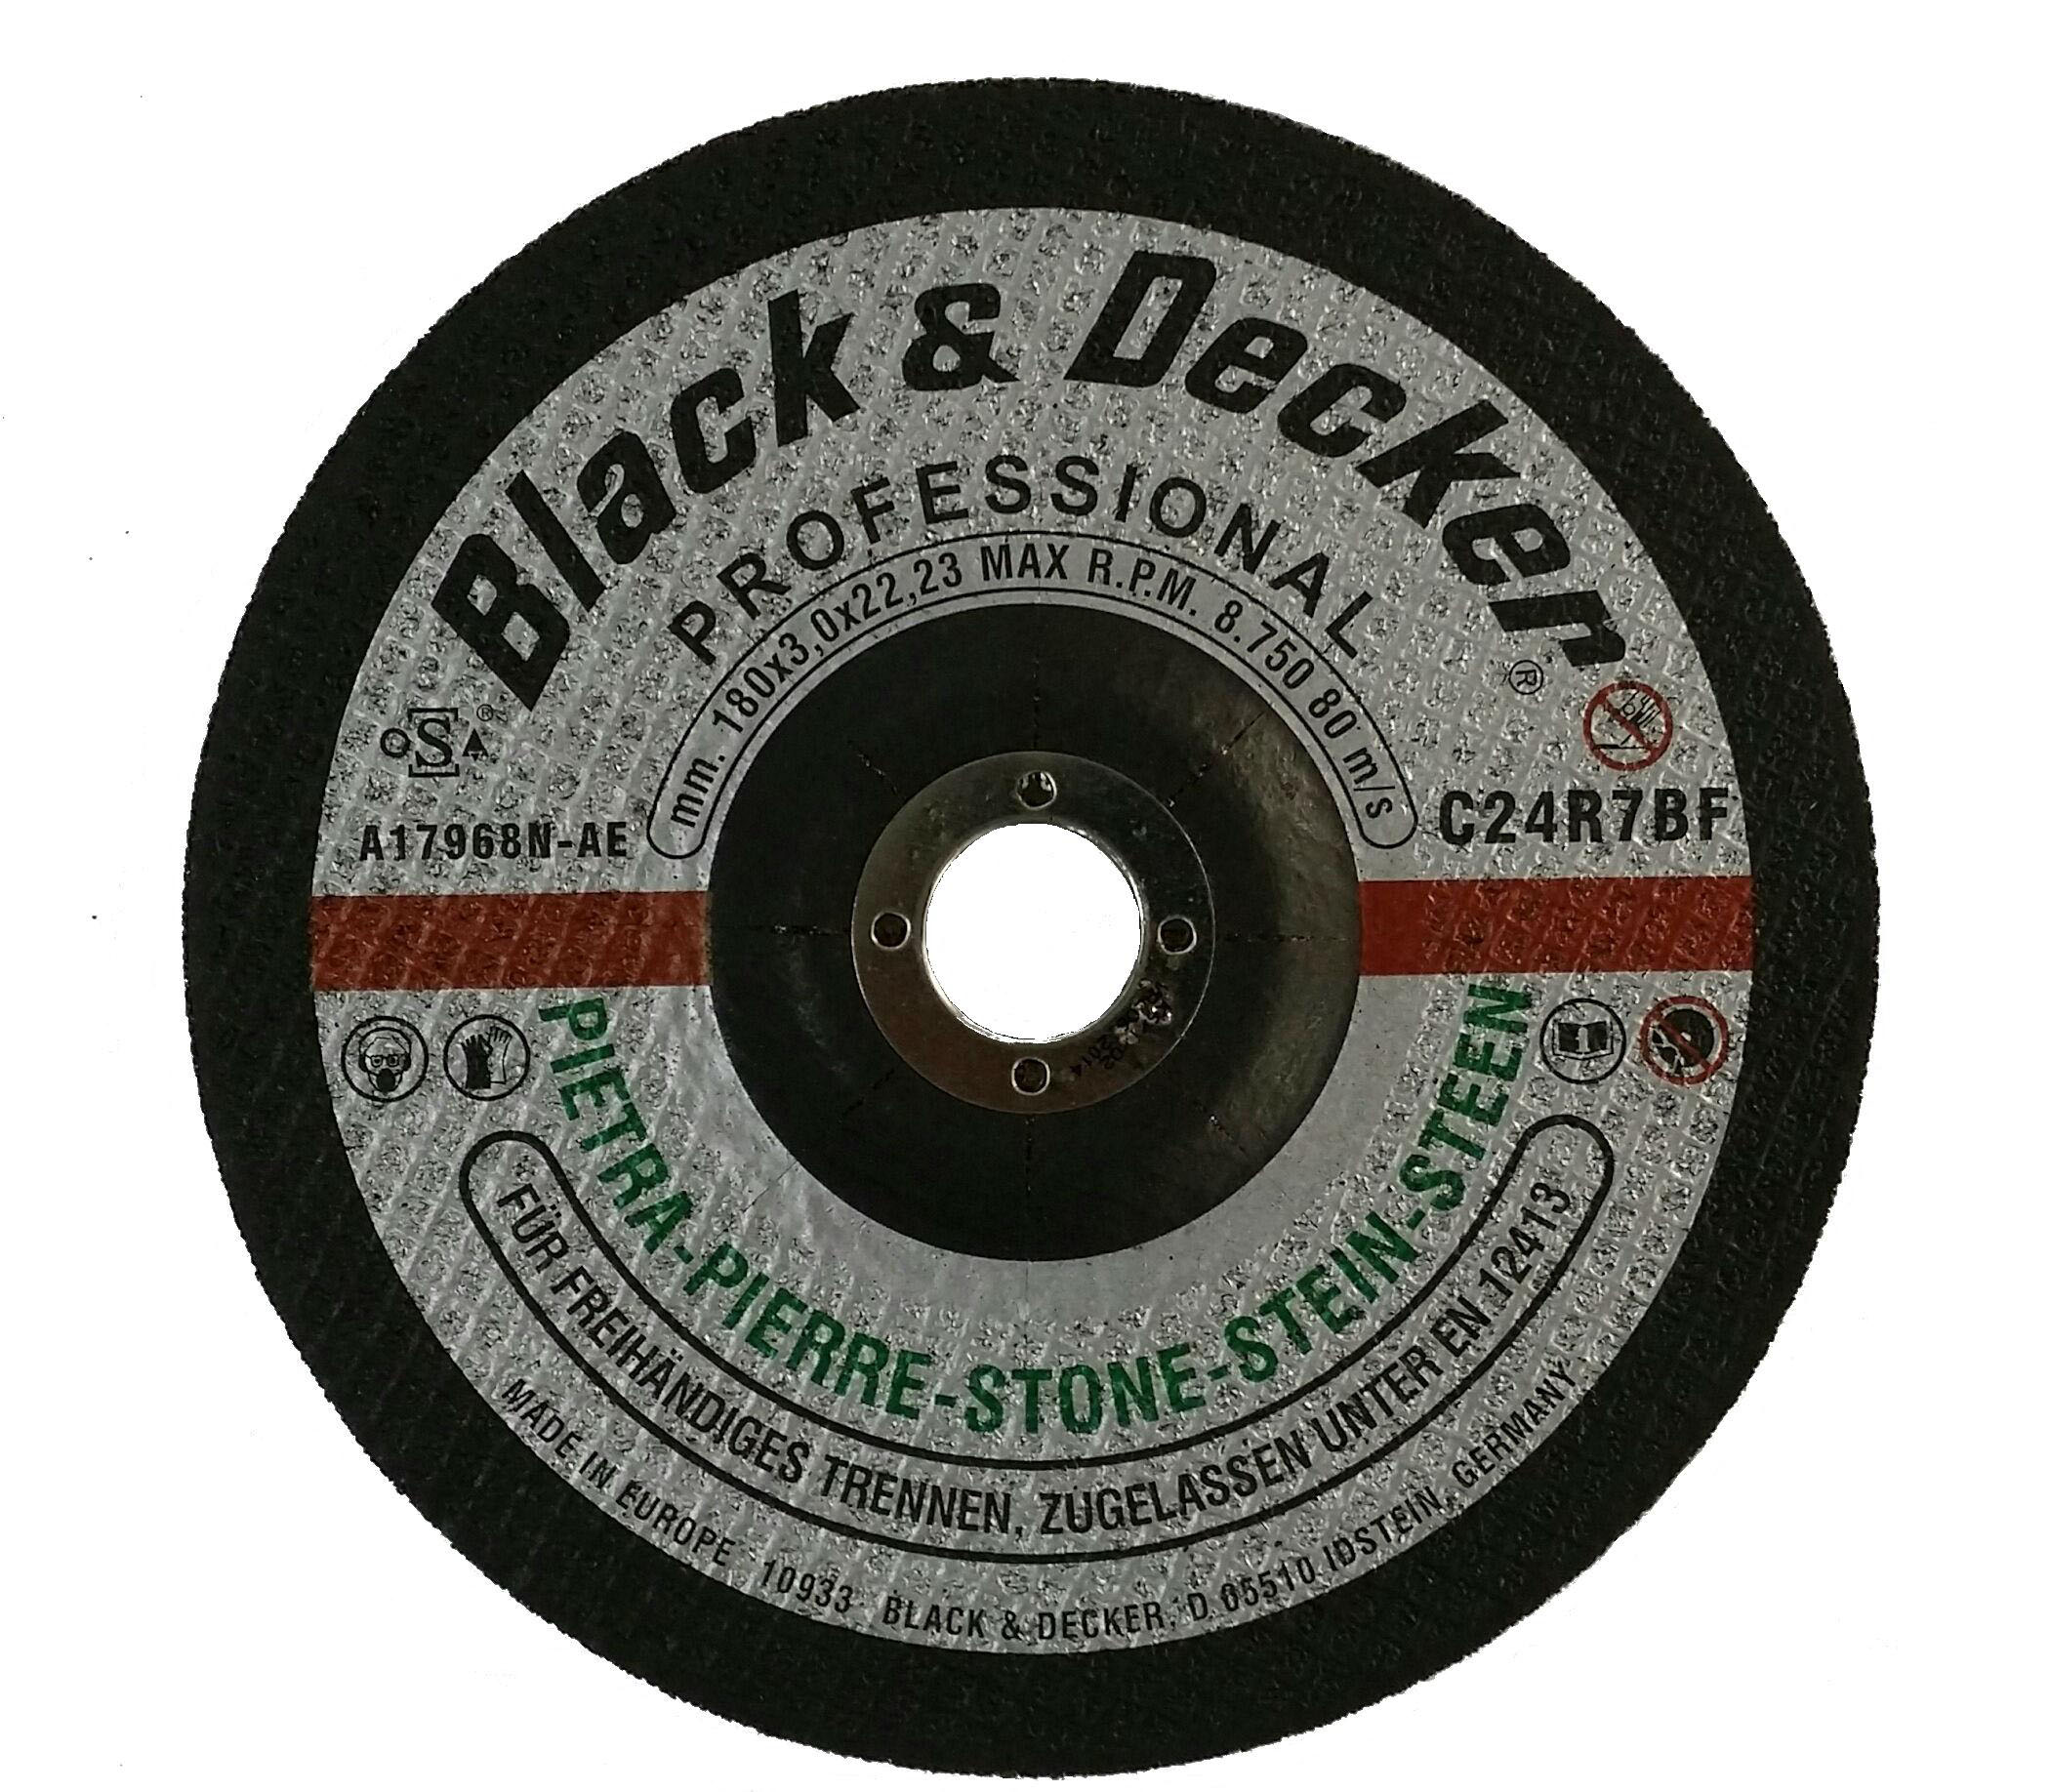 Black & Decker A17968N-AE - 7-inch Stone Cutting Disc